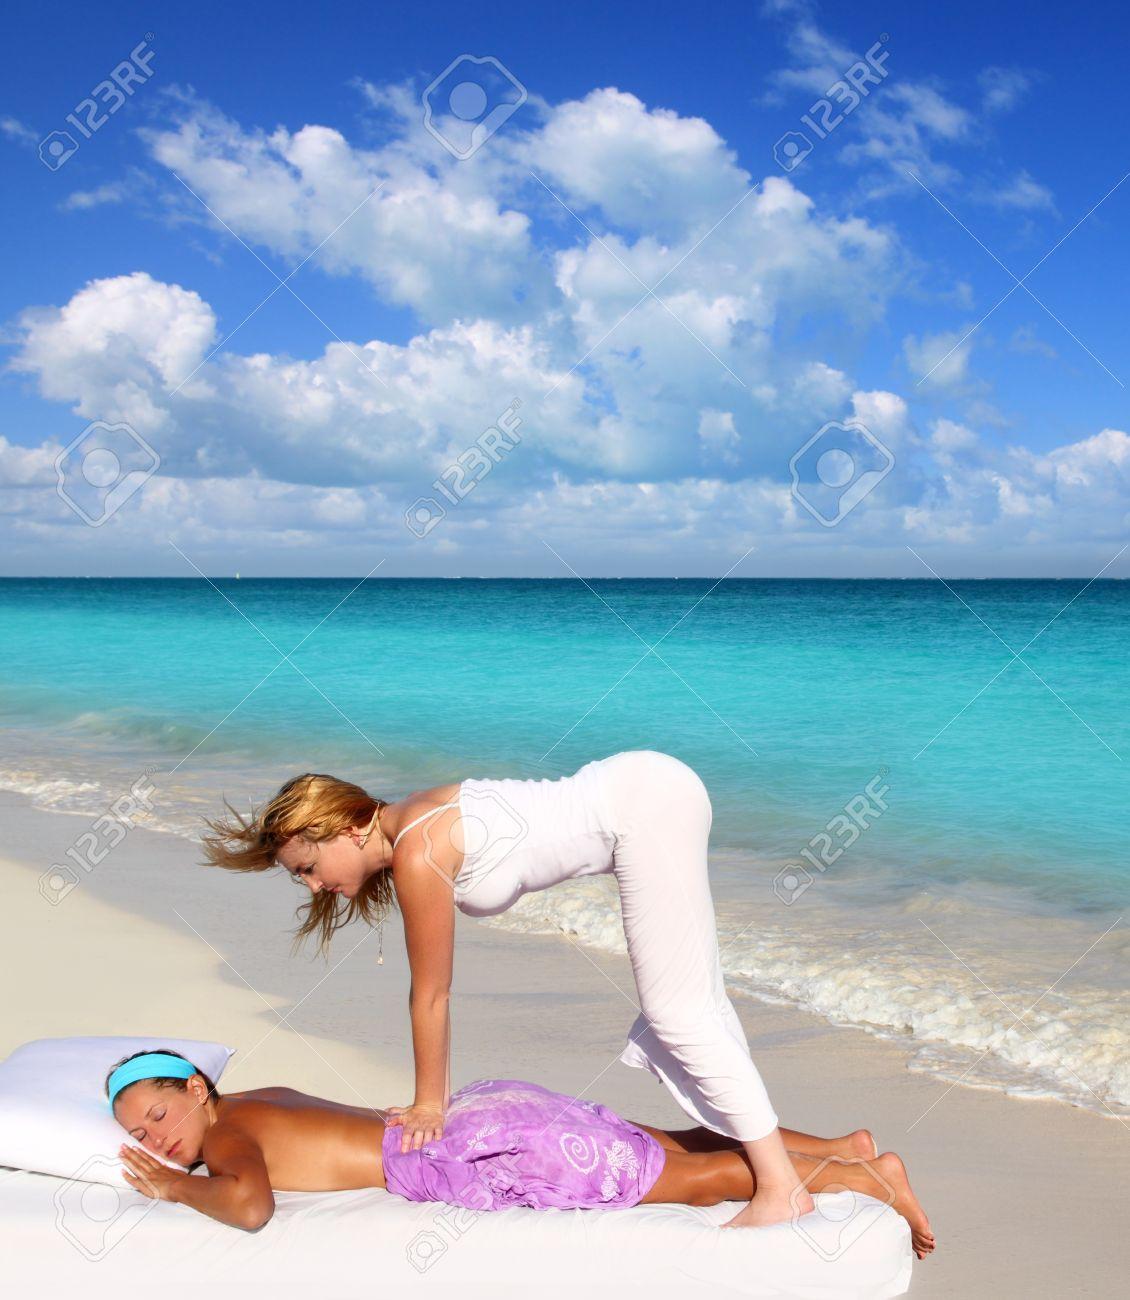 Caribbean beach massage shiatsu waist pressure woman outdoor paradise Stock Photo - 9142402